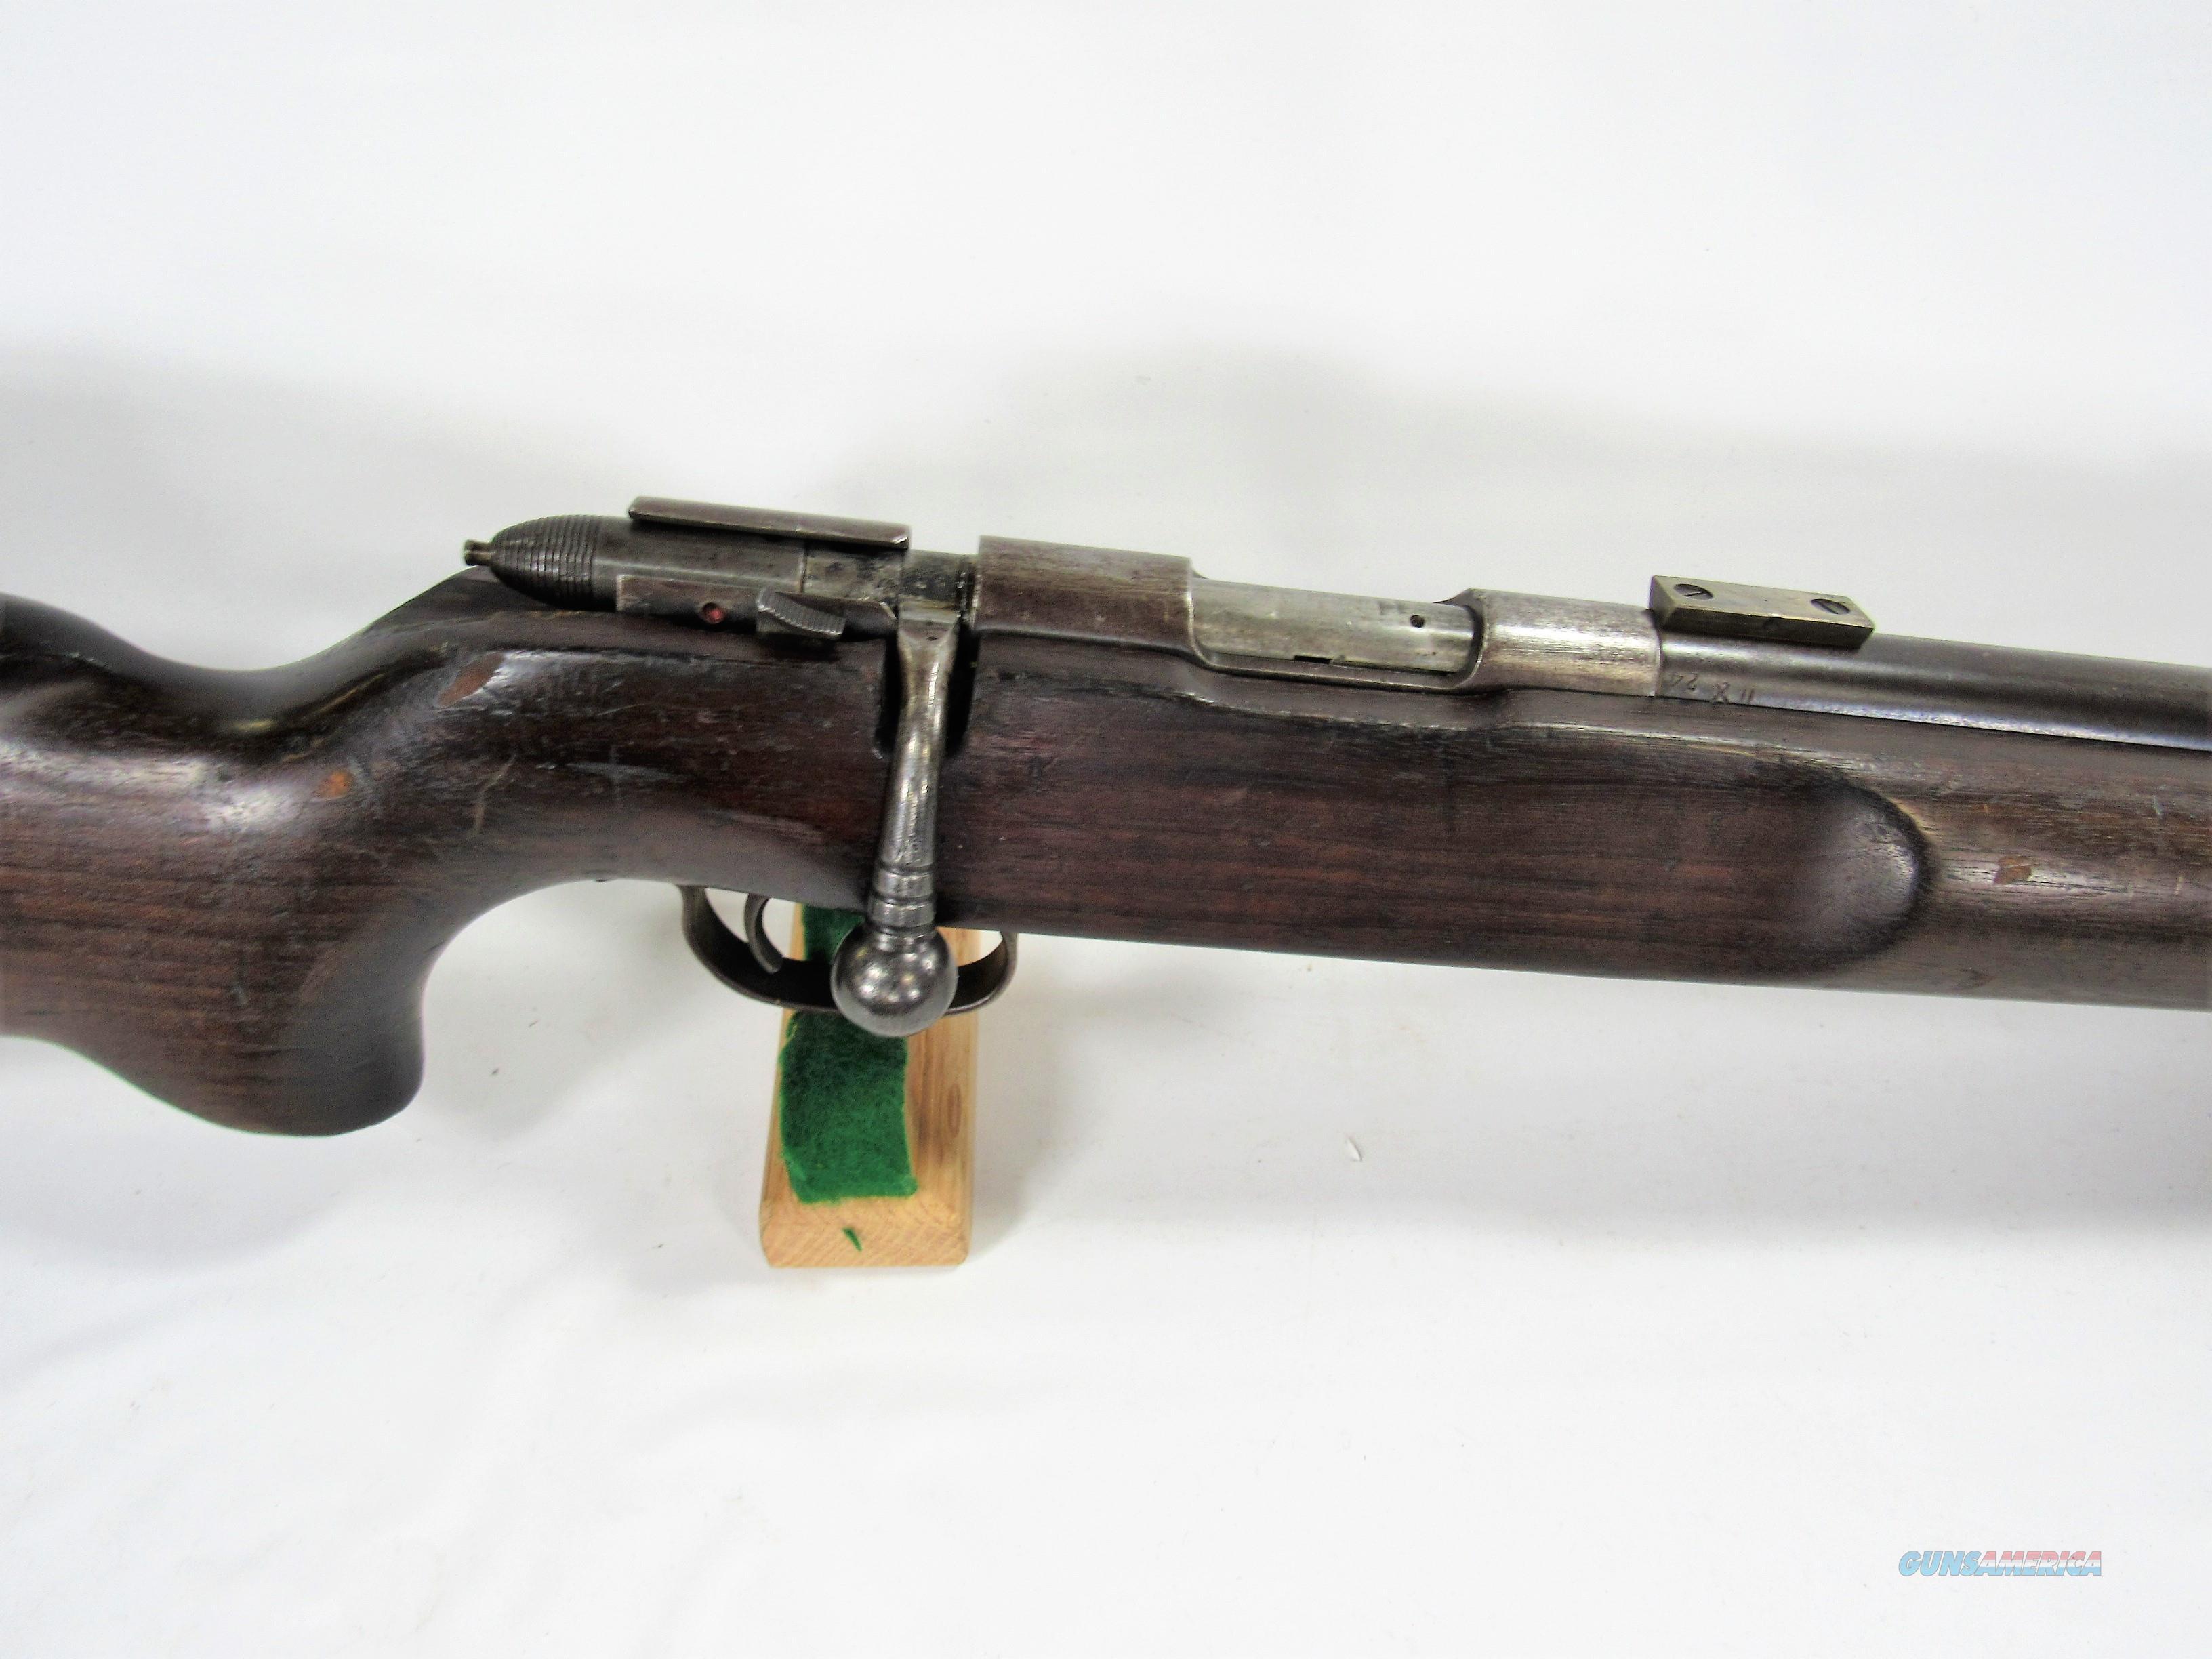 67R REMINGTON 513T 22  Guns > Rifles > Remington Rifles - Modern > .22 Rimfire Models